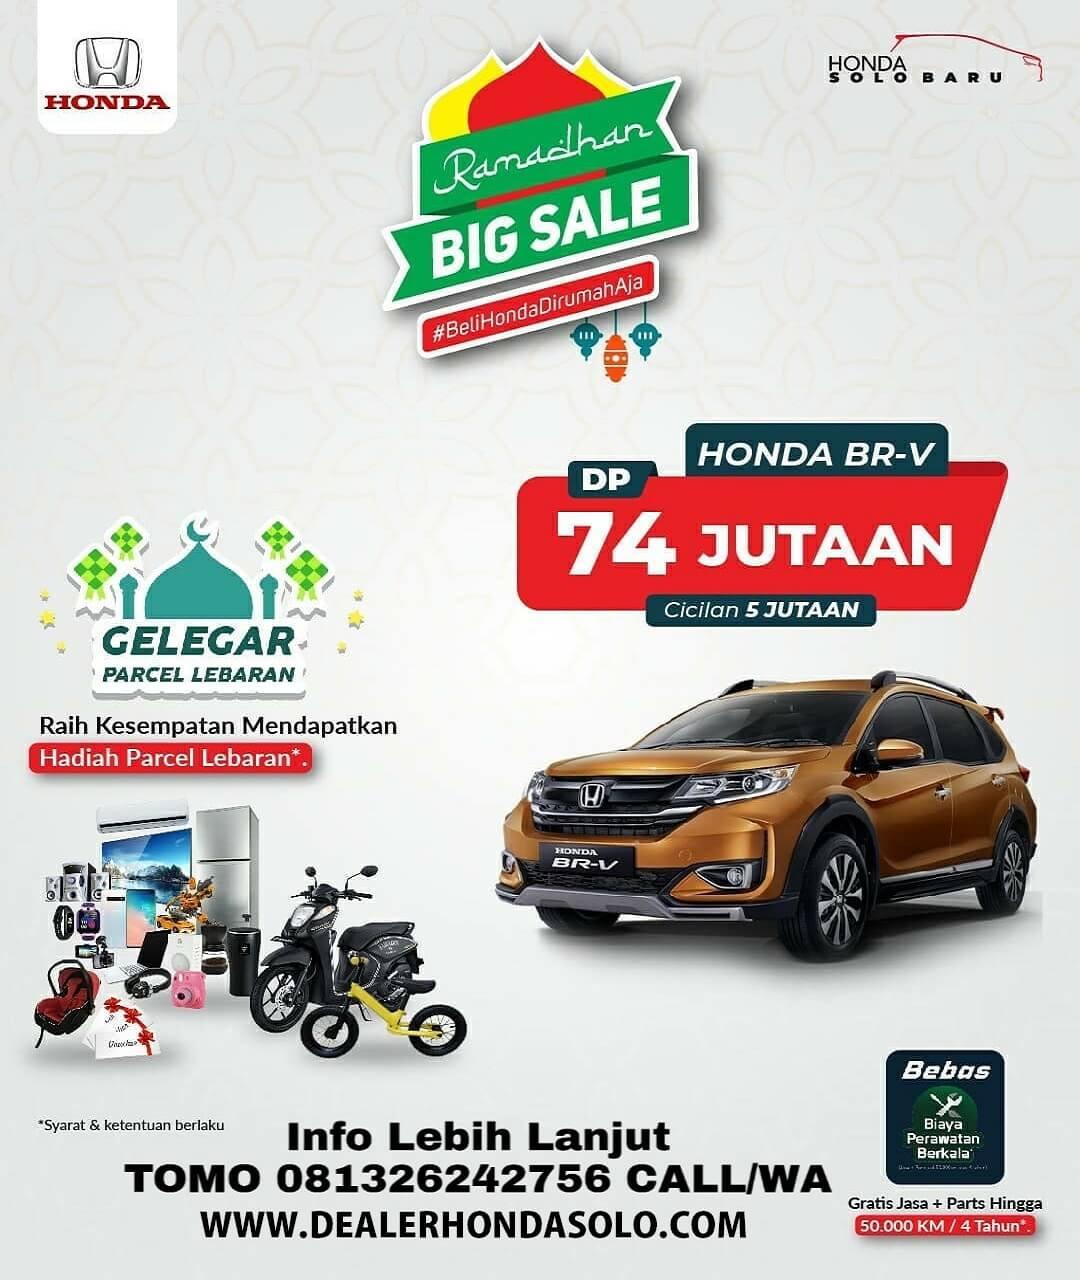 Promo Ramadhan Dealer Honda Solo Baru